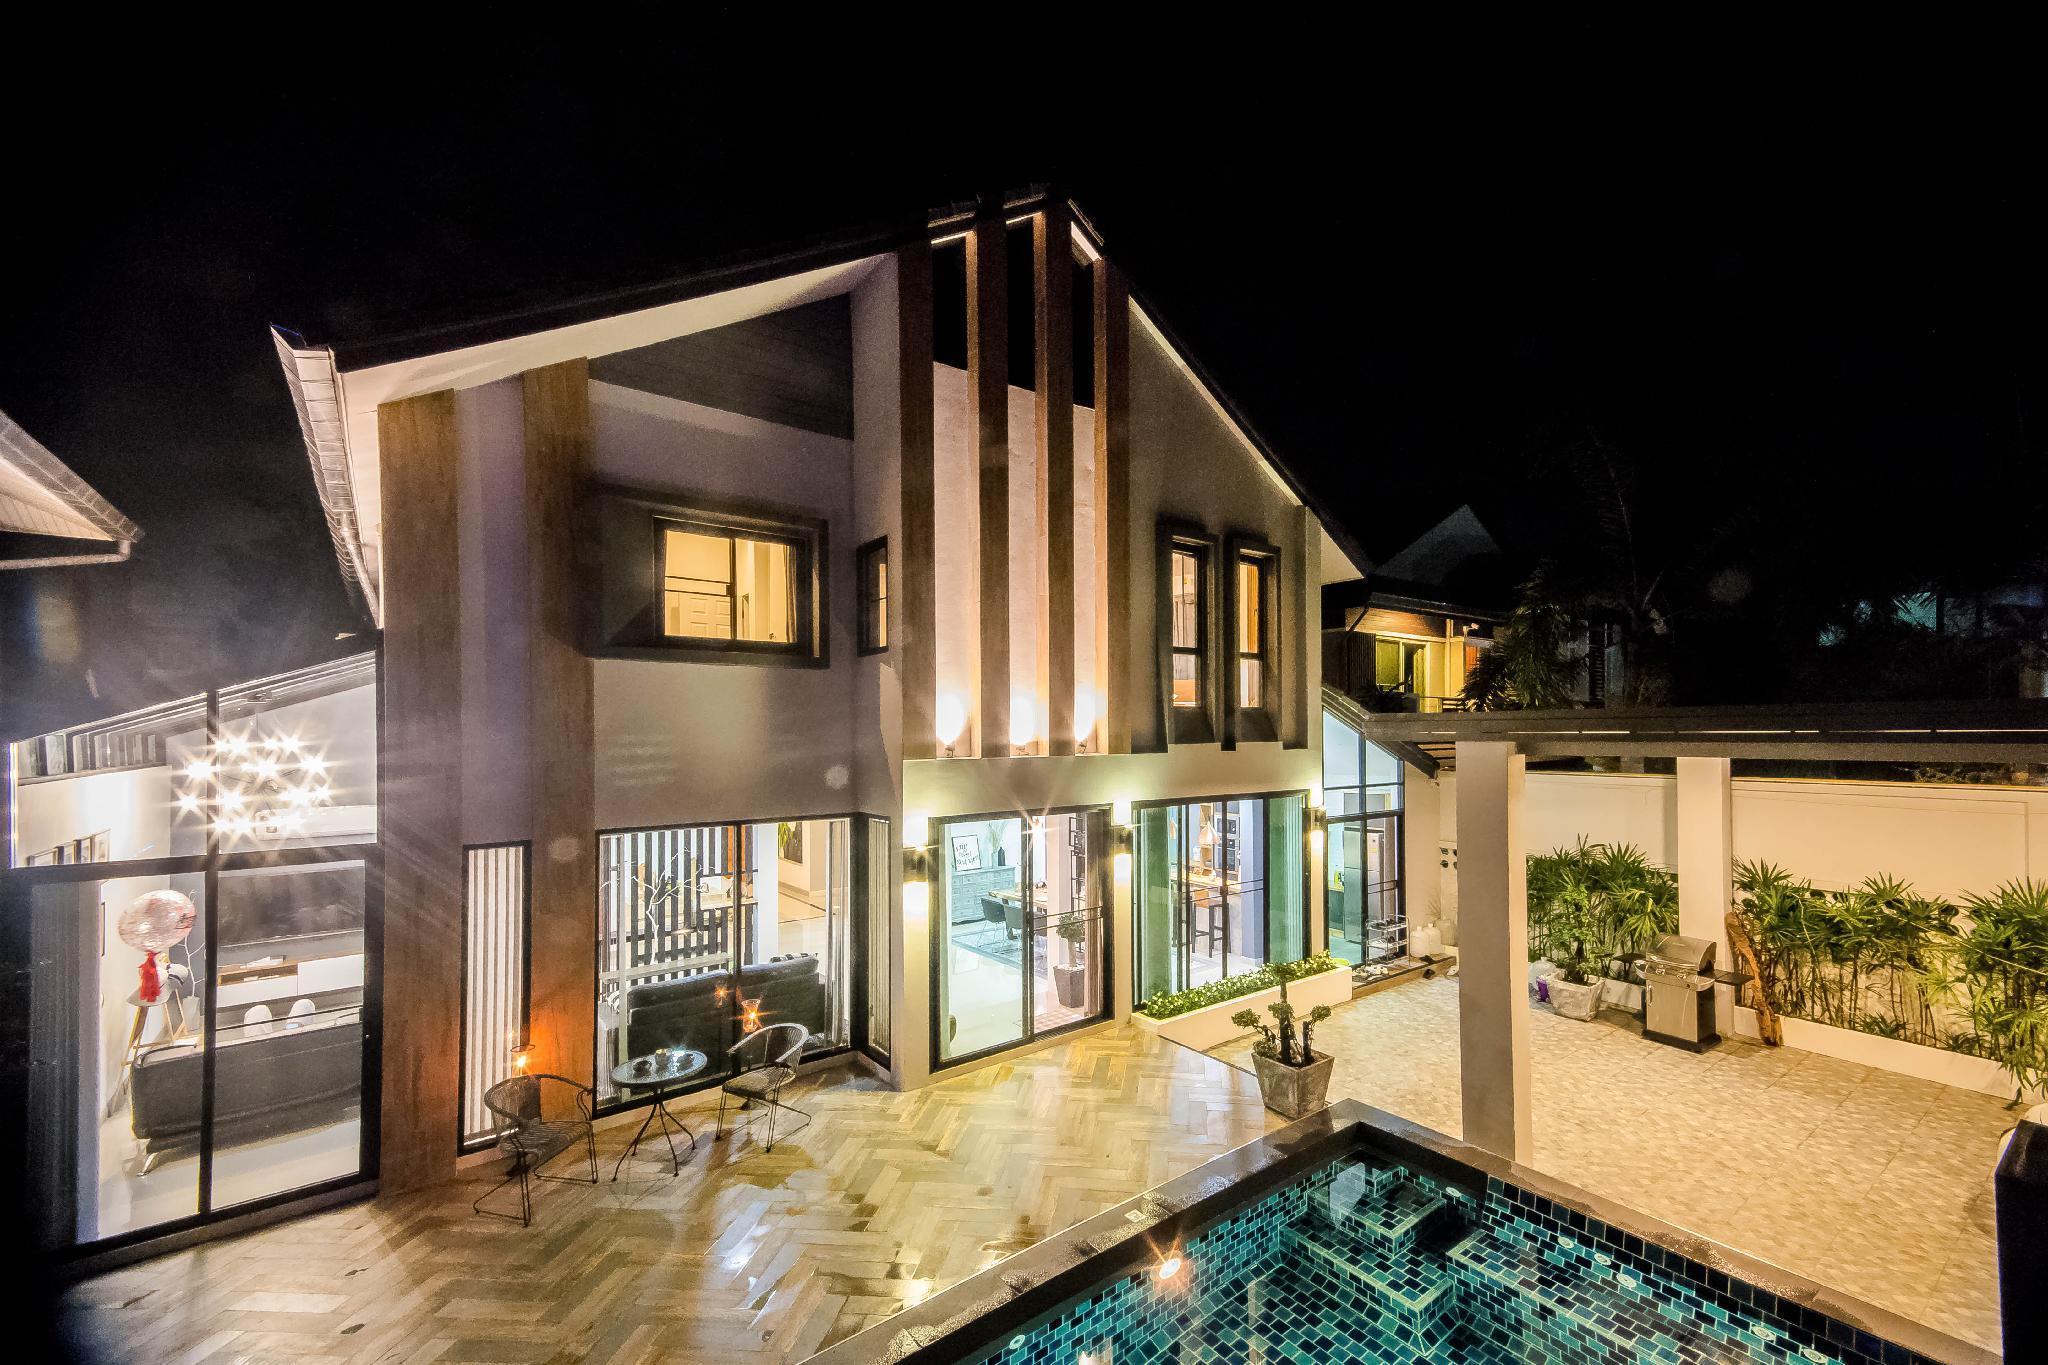 Chiang Mai 7-Bedroom Pool Villa วิลลา 7 ห้องนอน 7 ห้องน้ำส่วนตัว ขนาด 450 ตร.ม. – สันทราย